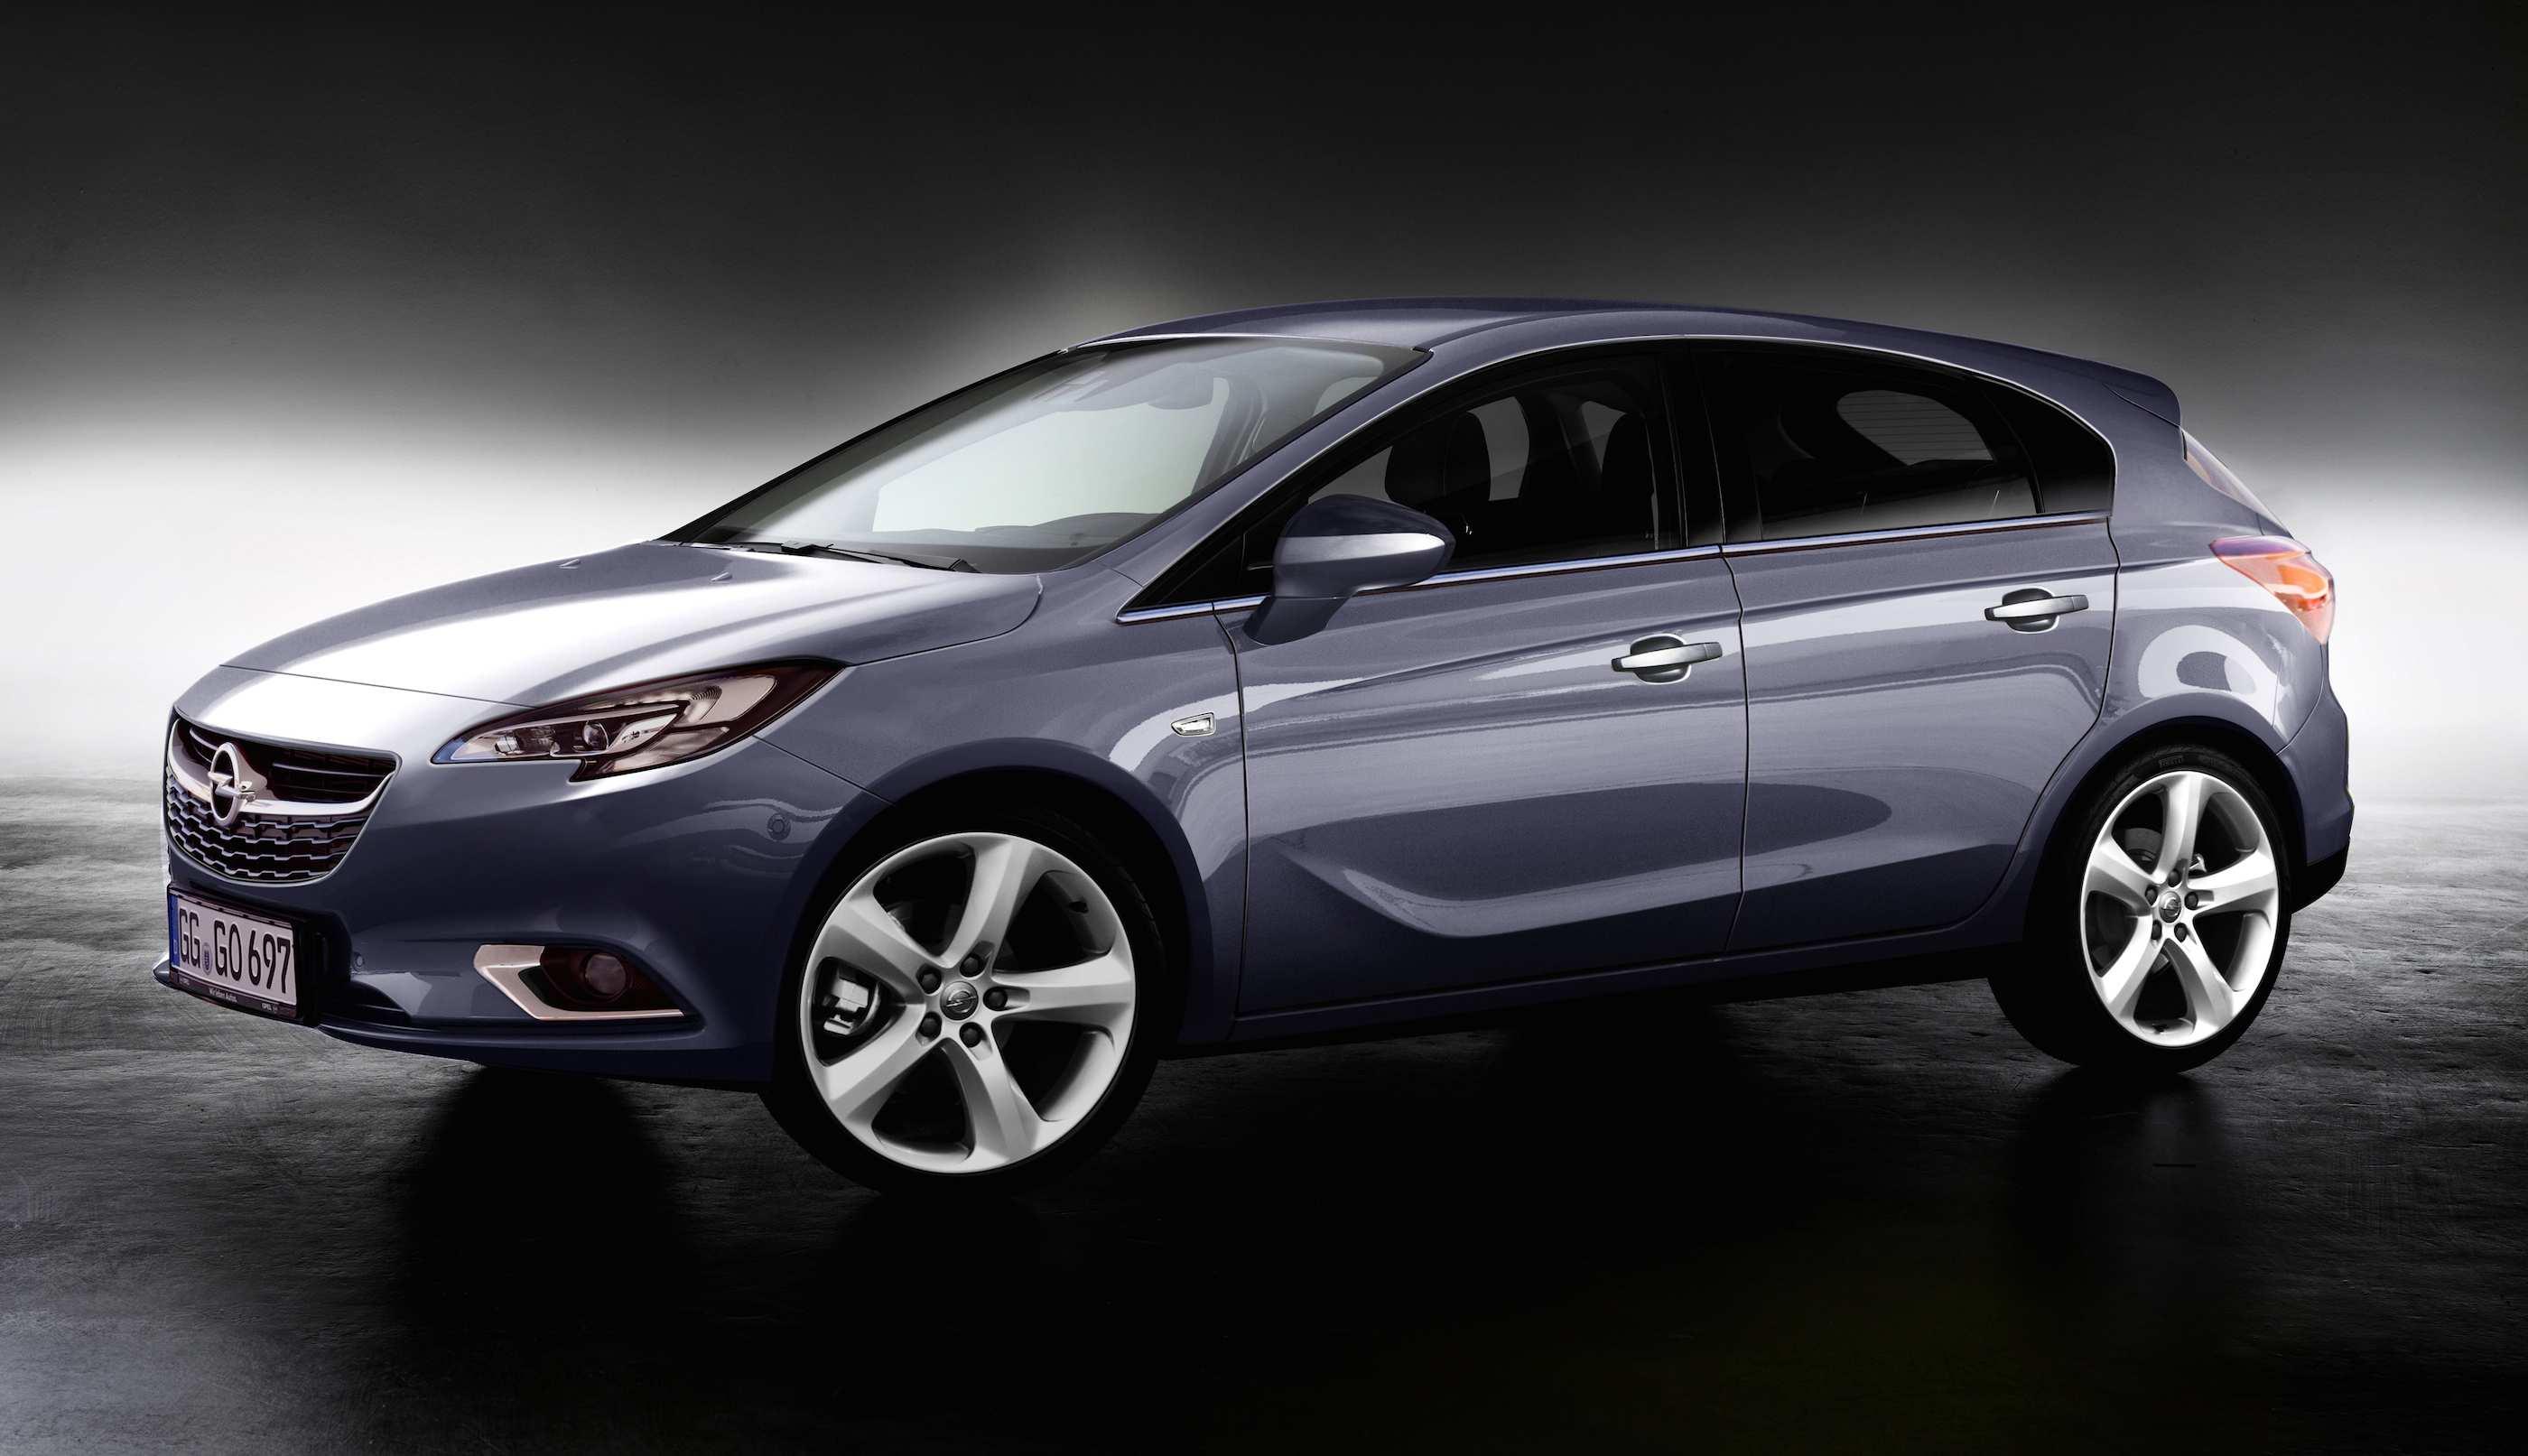 88 New Opel Zafira 2020 Interior for Opel Zafira 2020